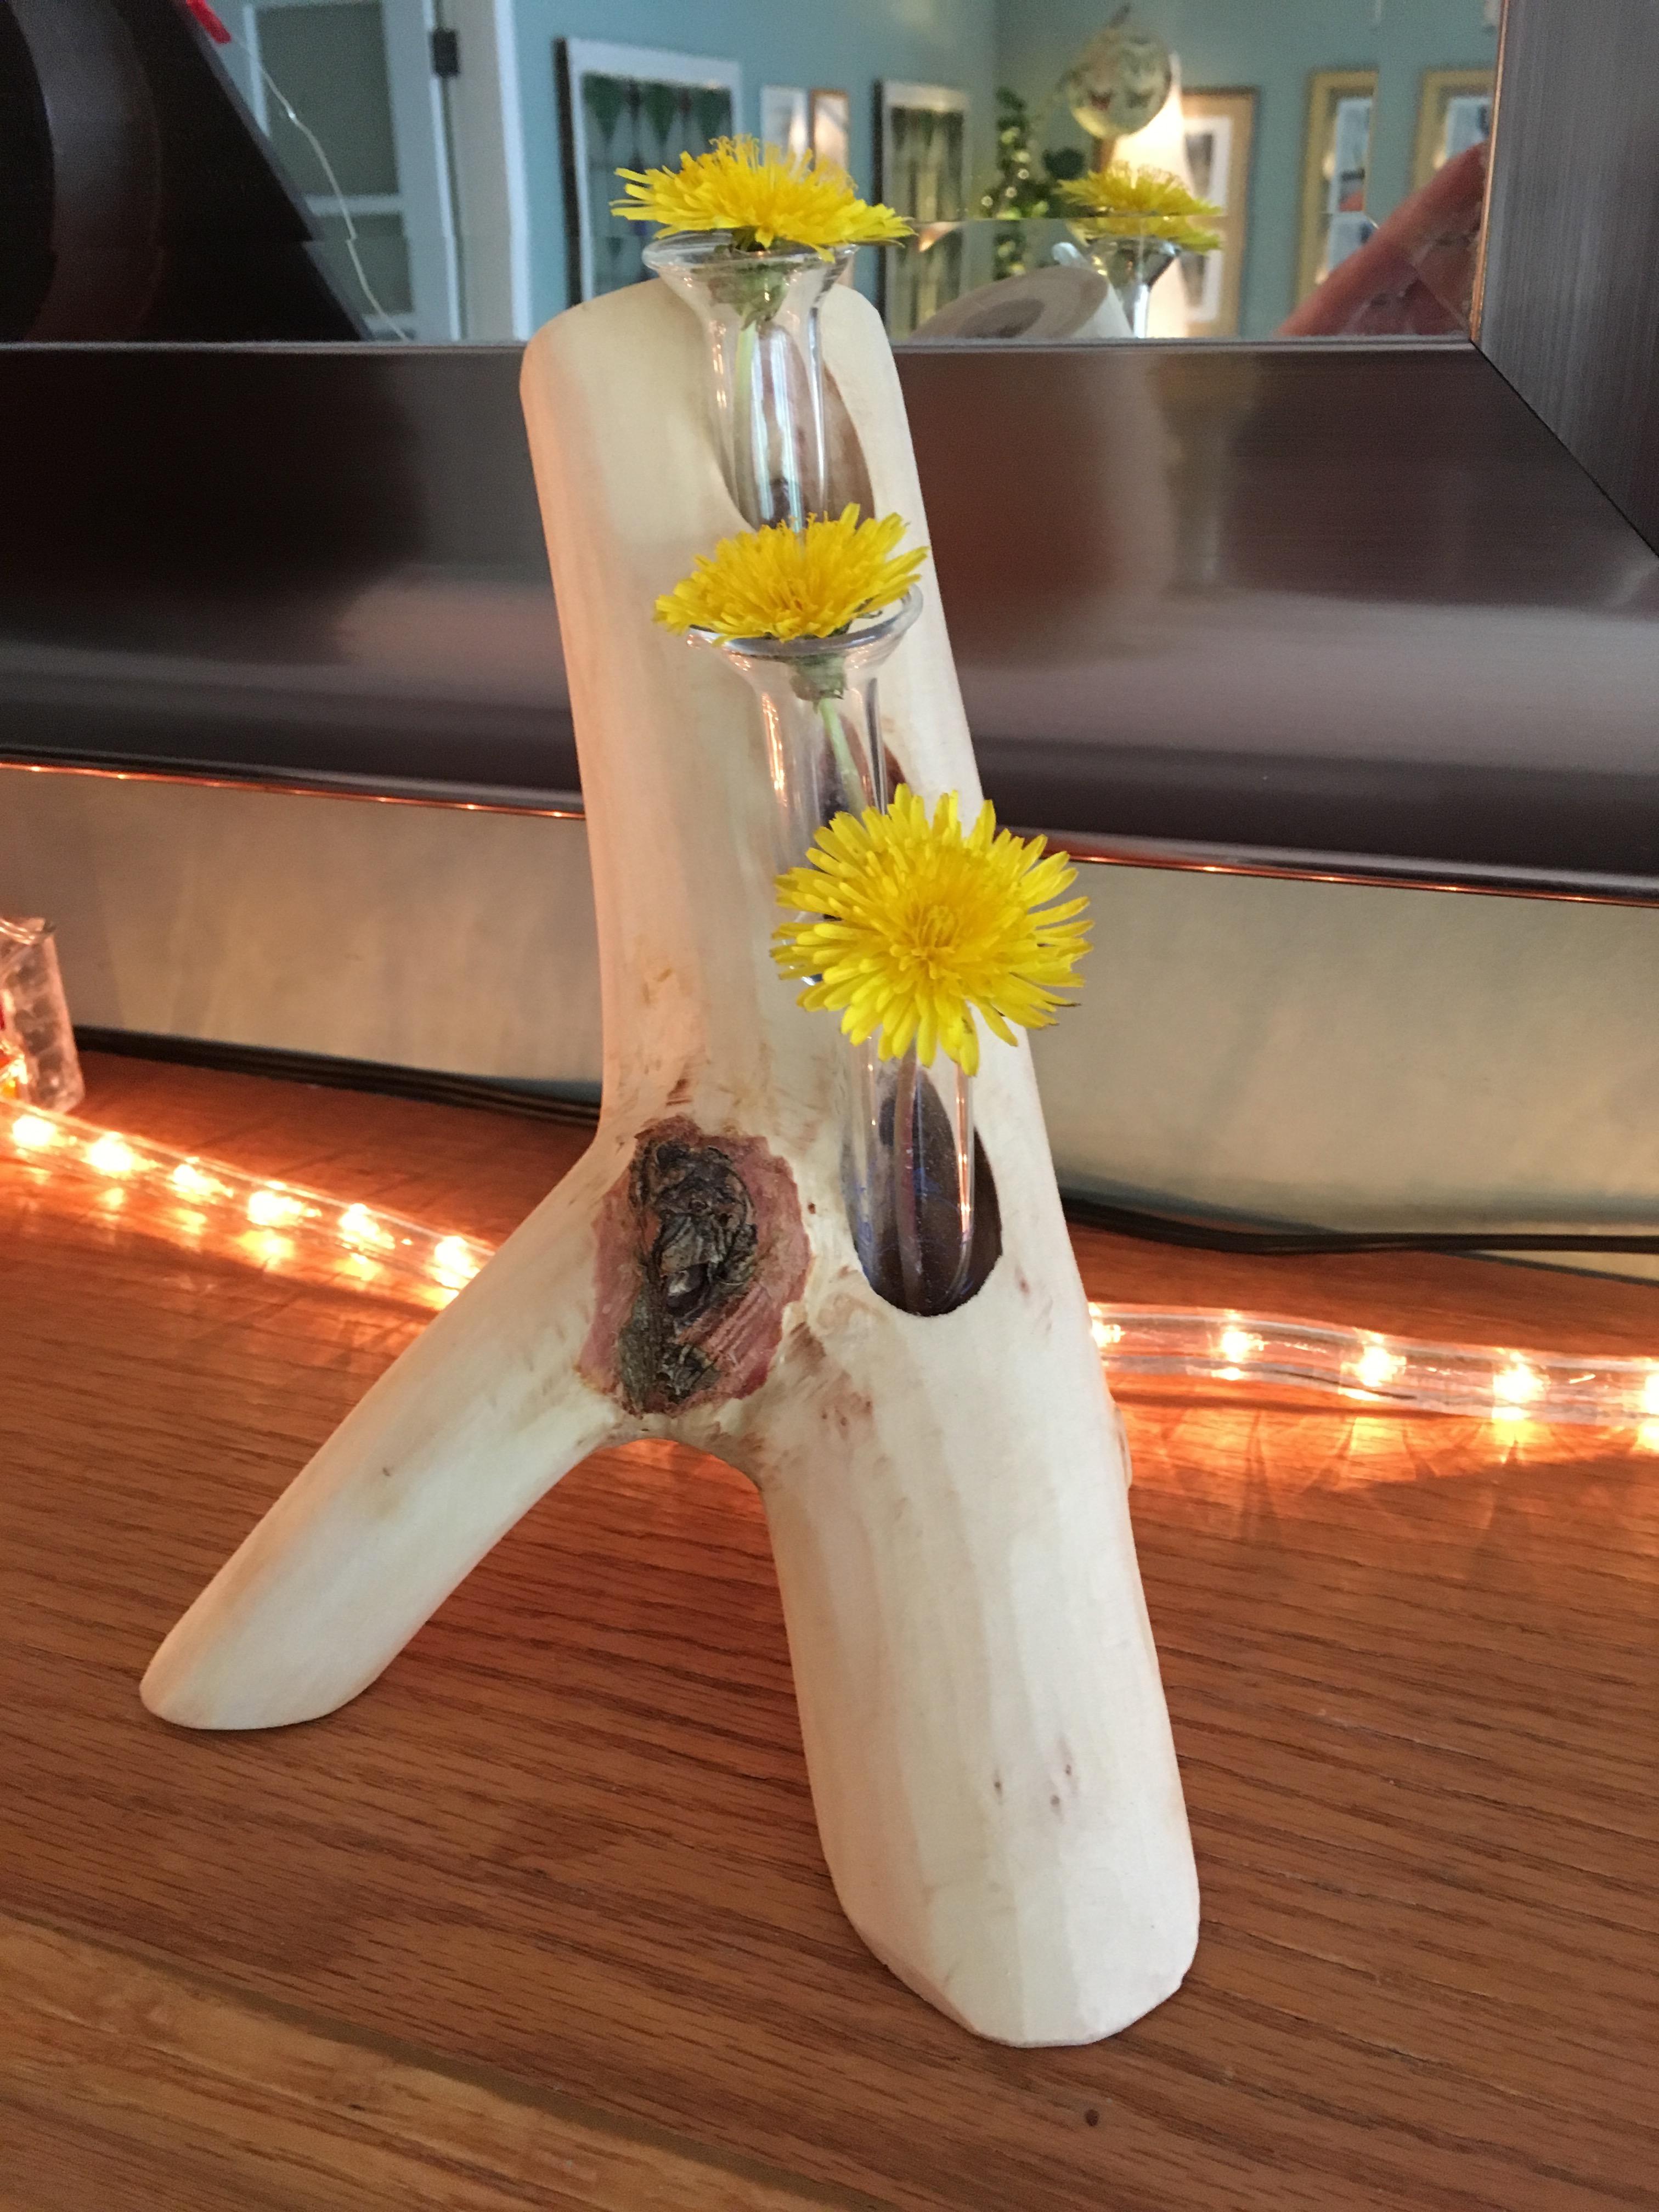 Picture of Dandelion Vase